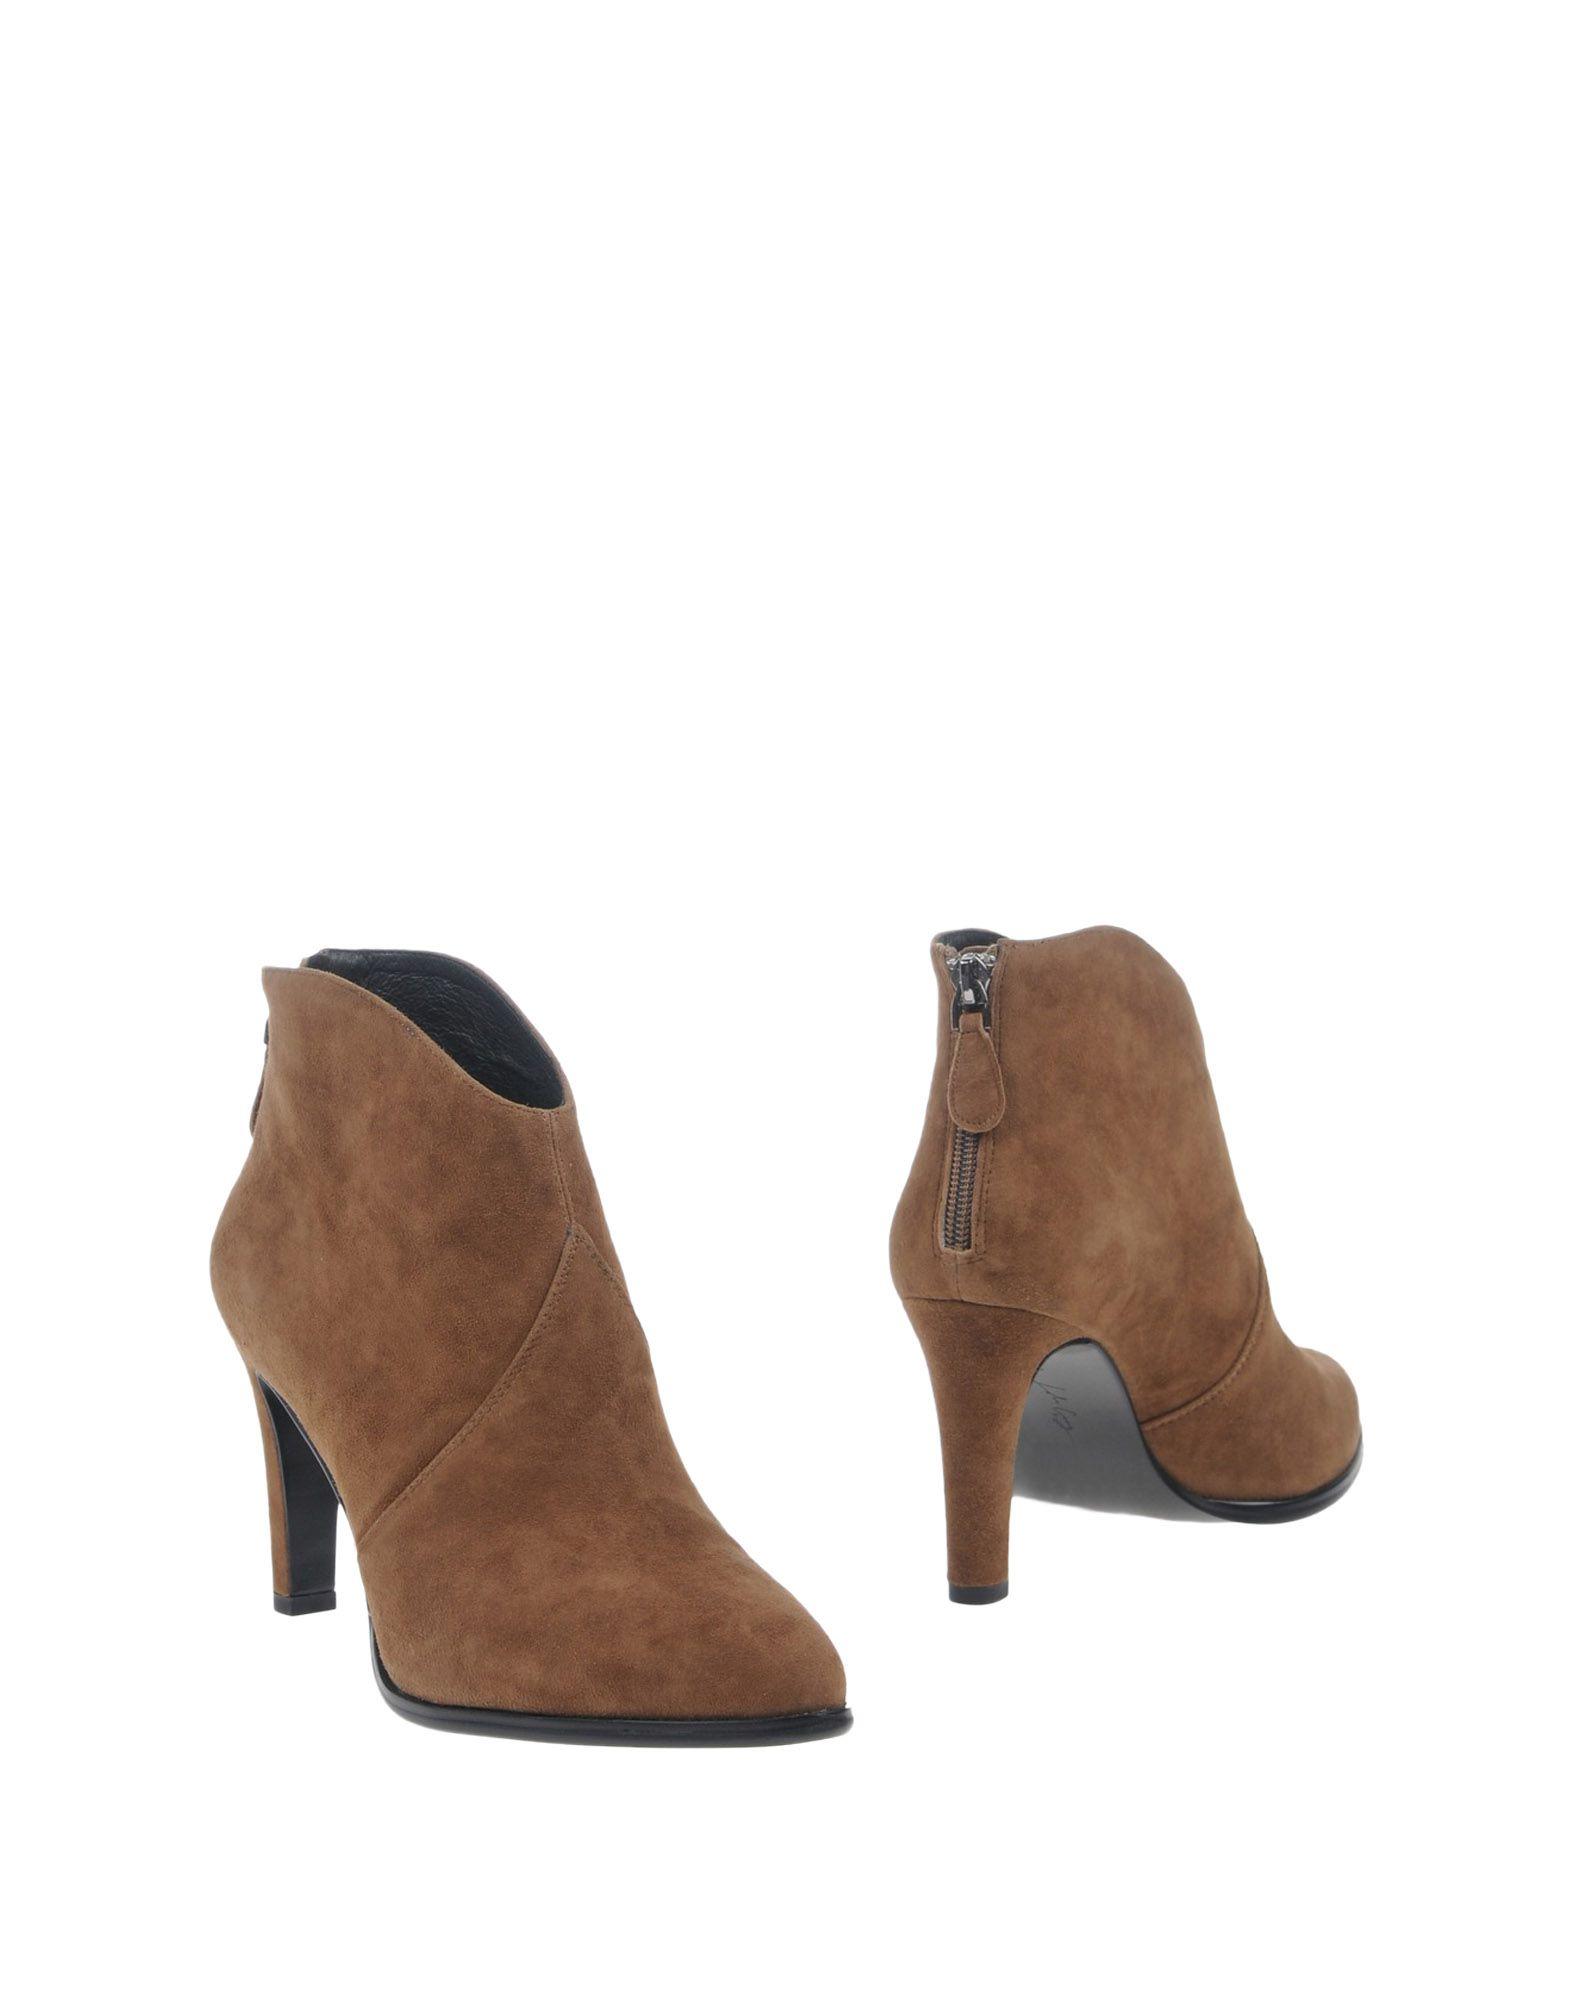 Gut um Cruz billige Schuhe zu tragenLola Cruz um Stiefelette Damen  11263357OU 8b160f